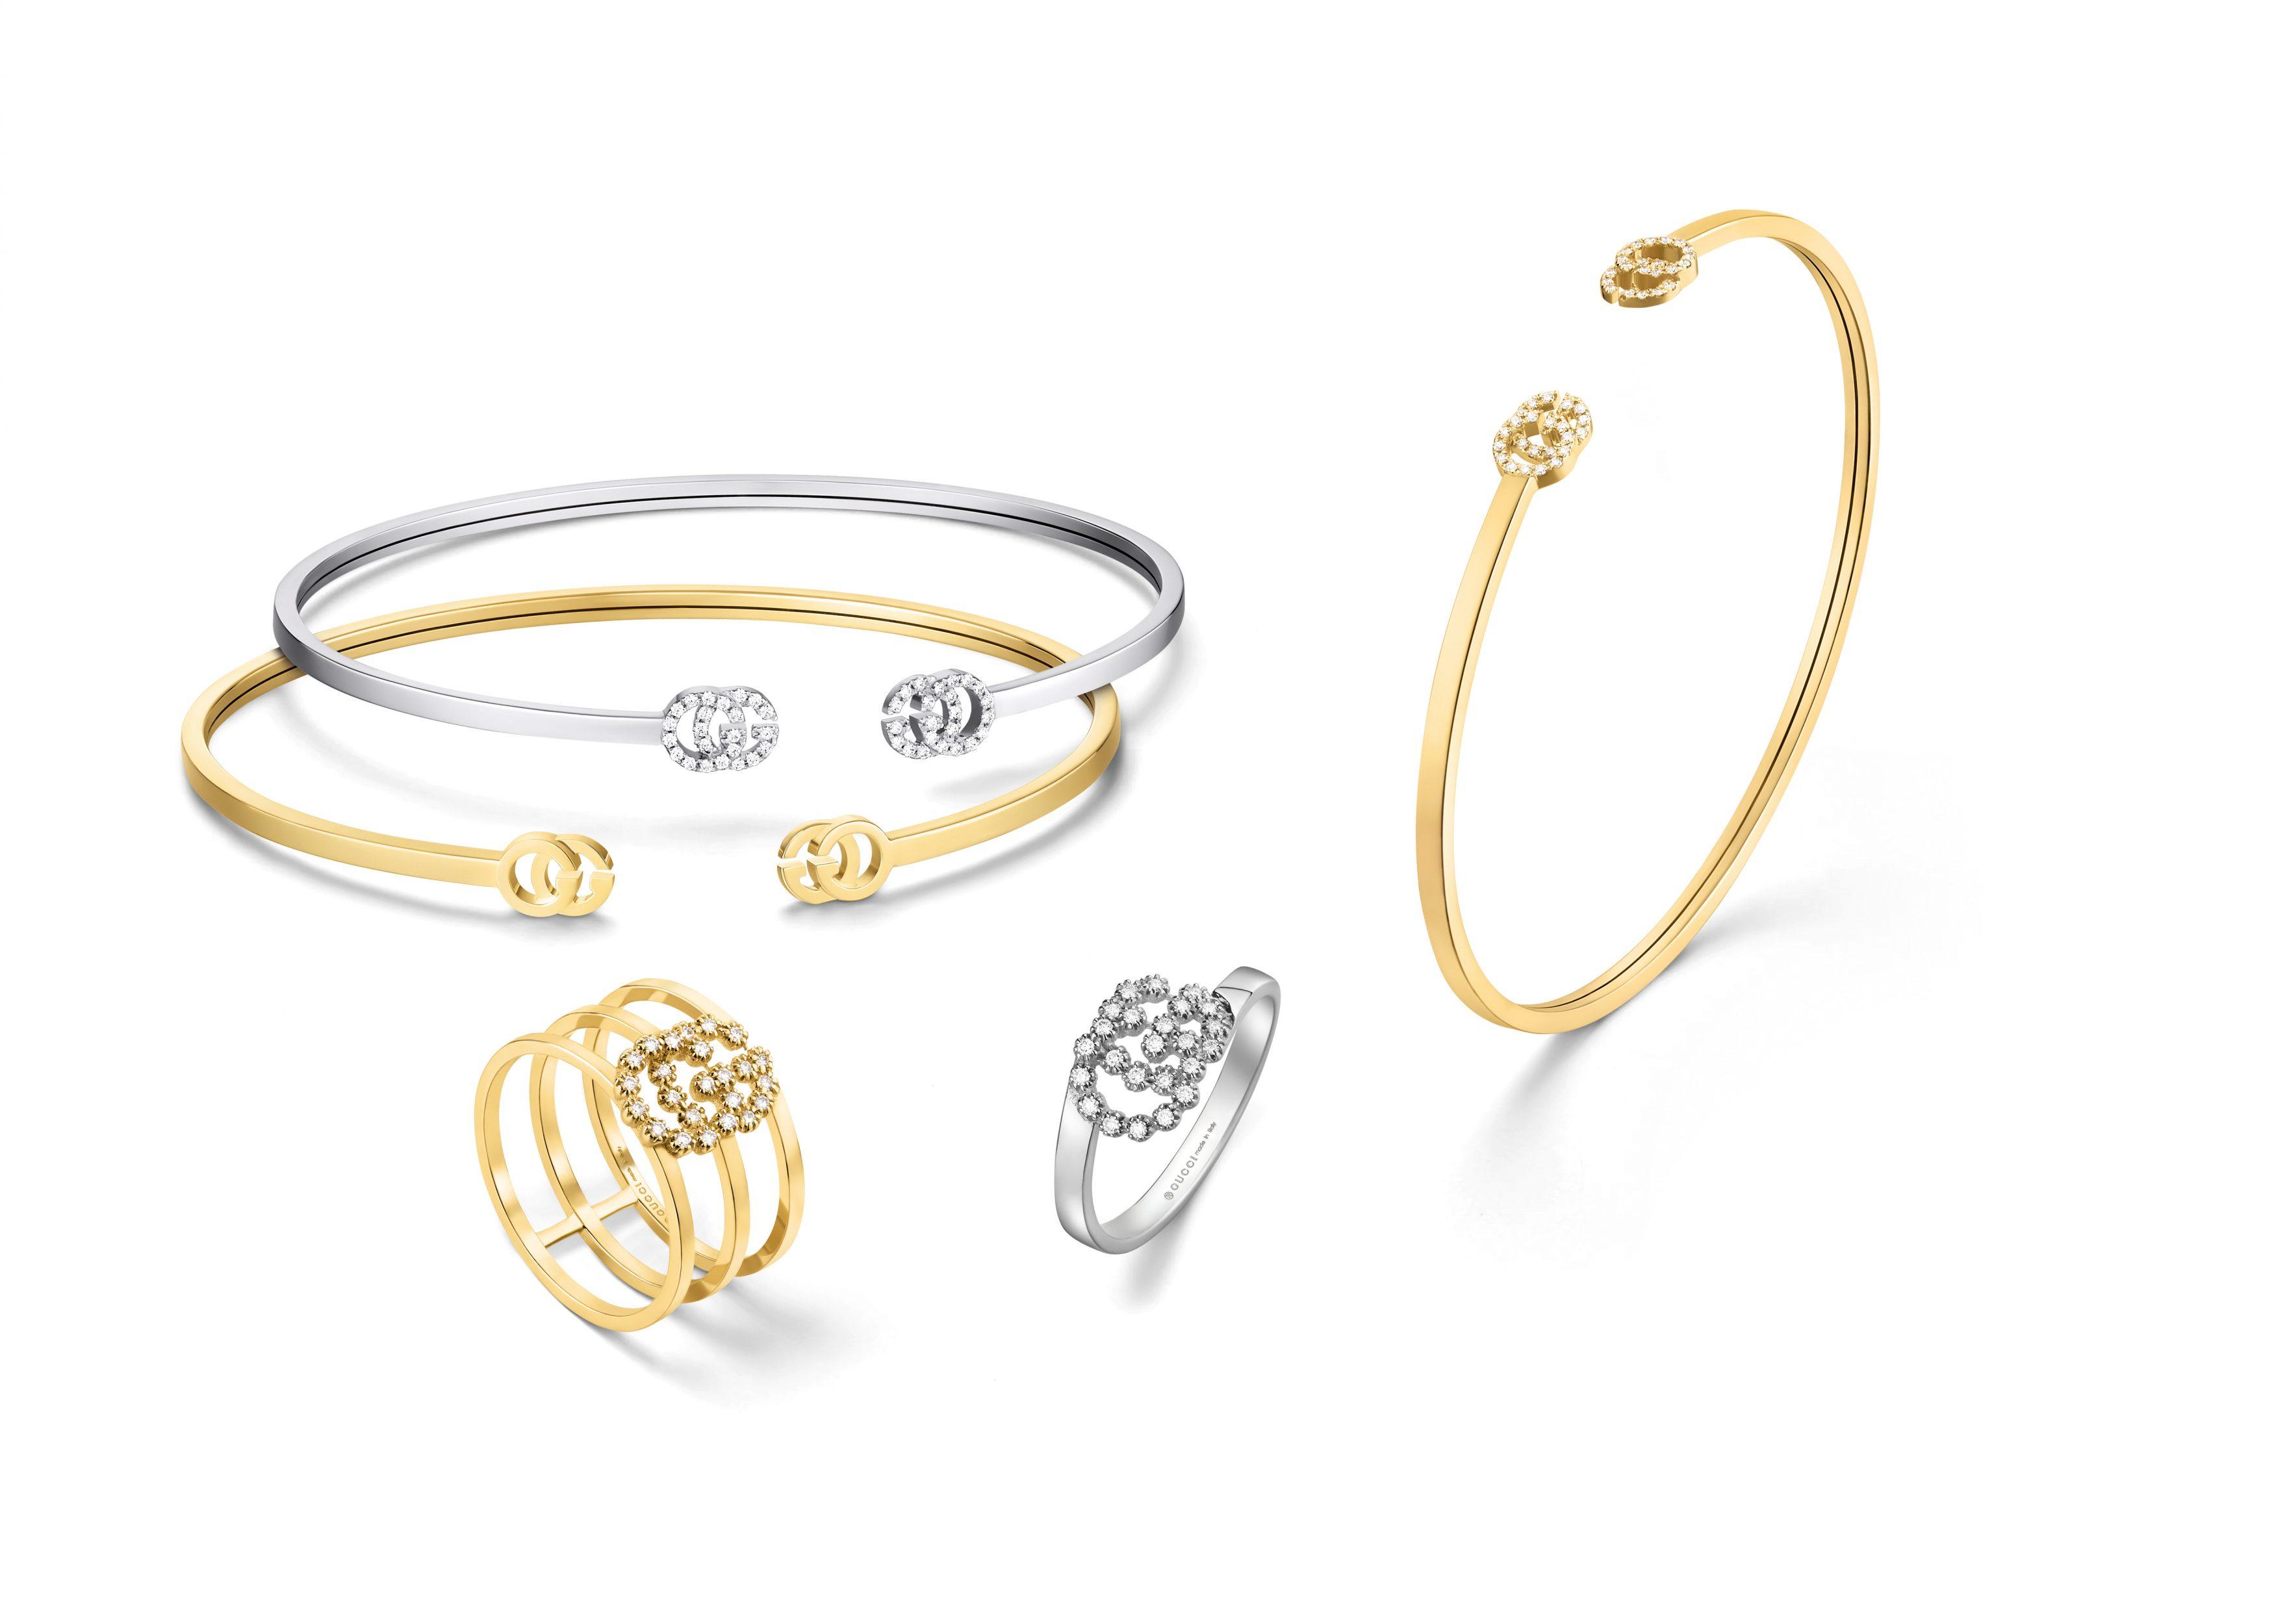 Gucci GG Running bangles and rings